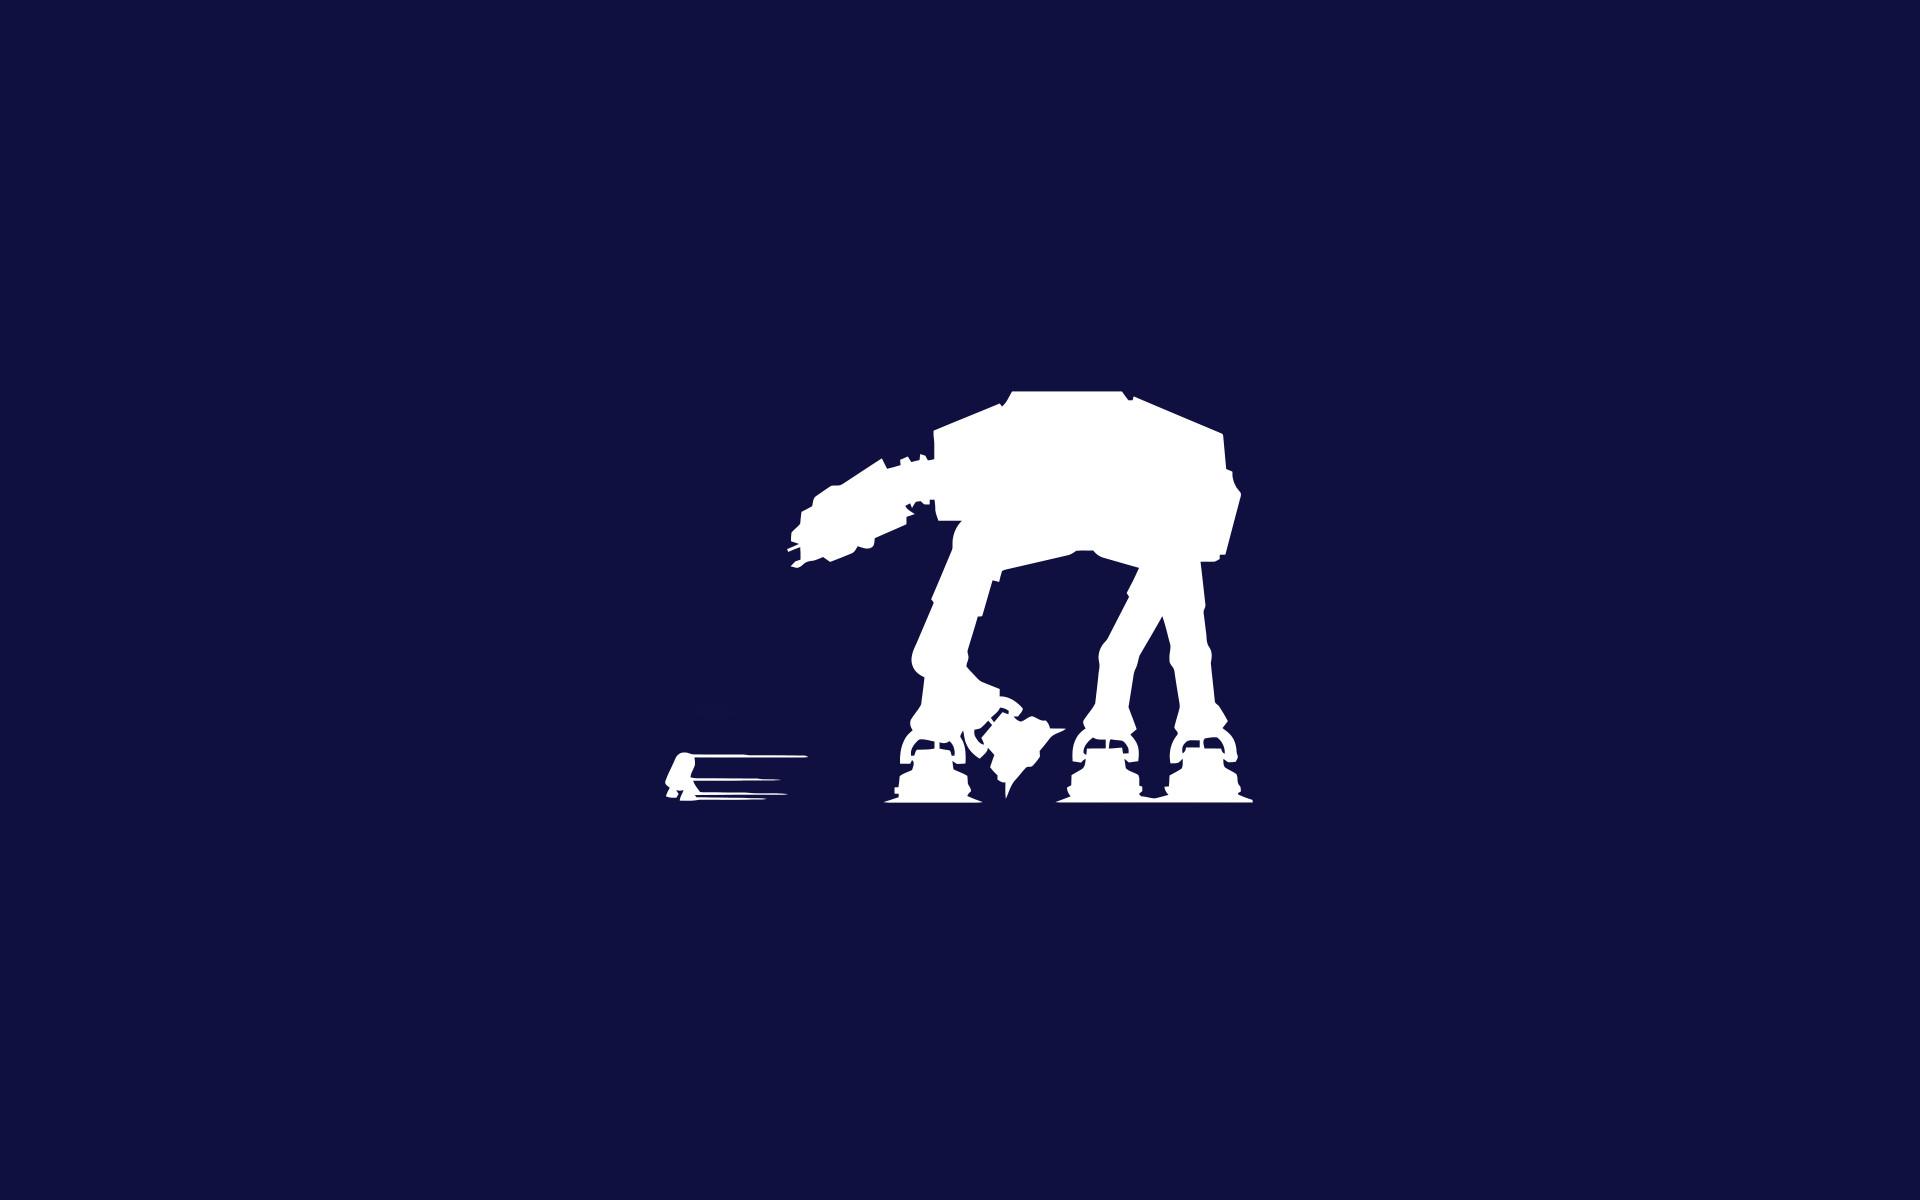 Funny Star Wars Wallpaper Wallpapertag